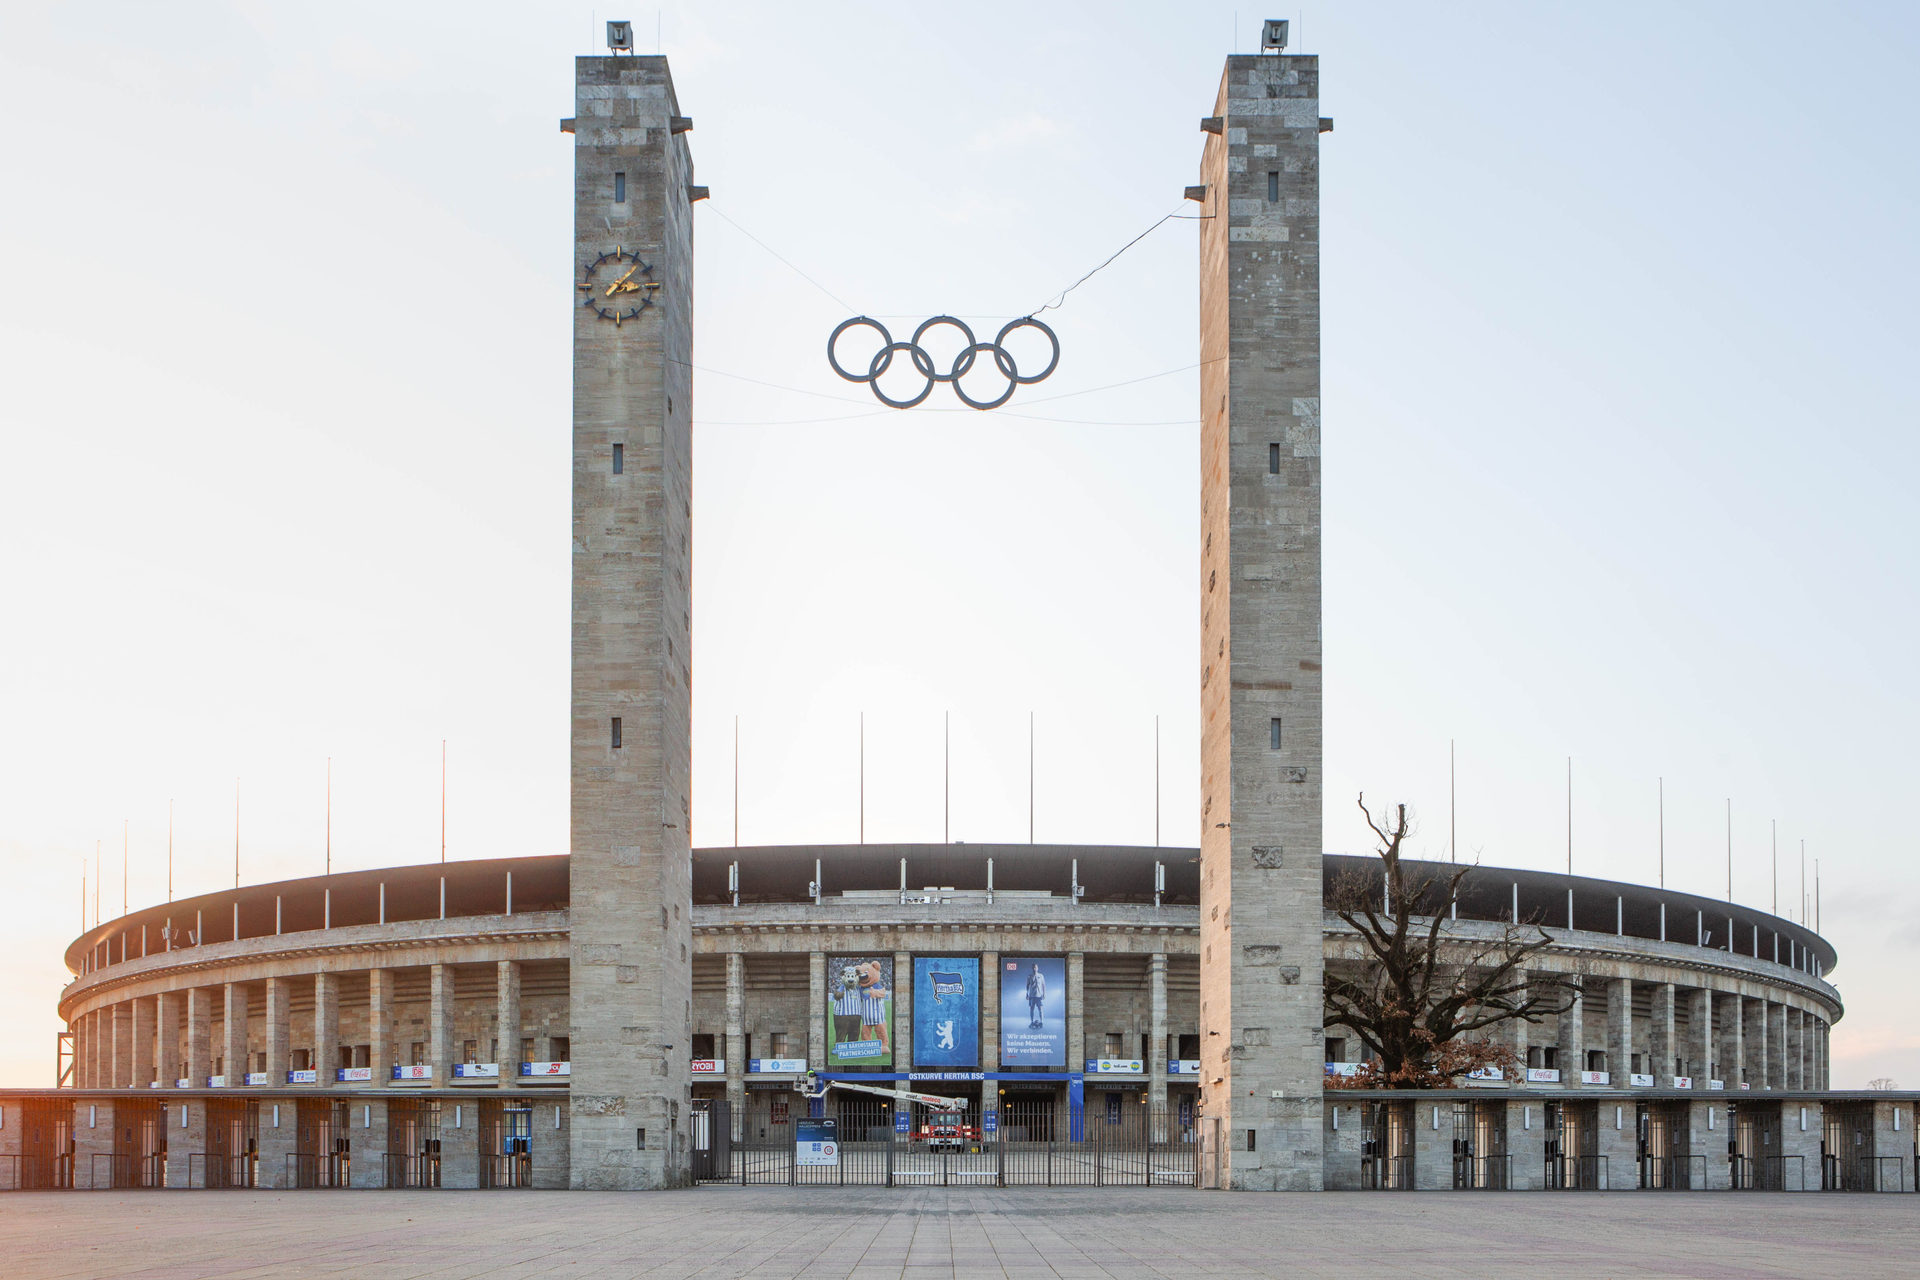 19_32_fA_DB_Hertha_Stadion--2.jpg